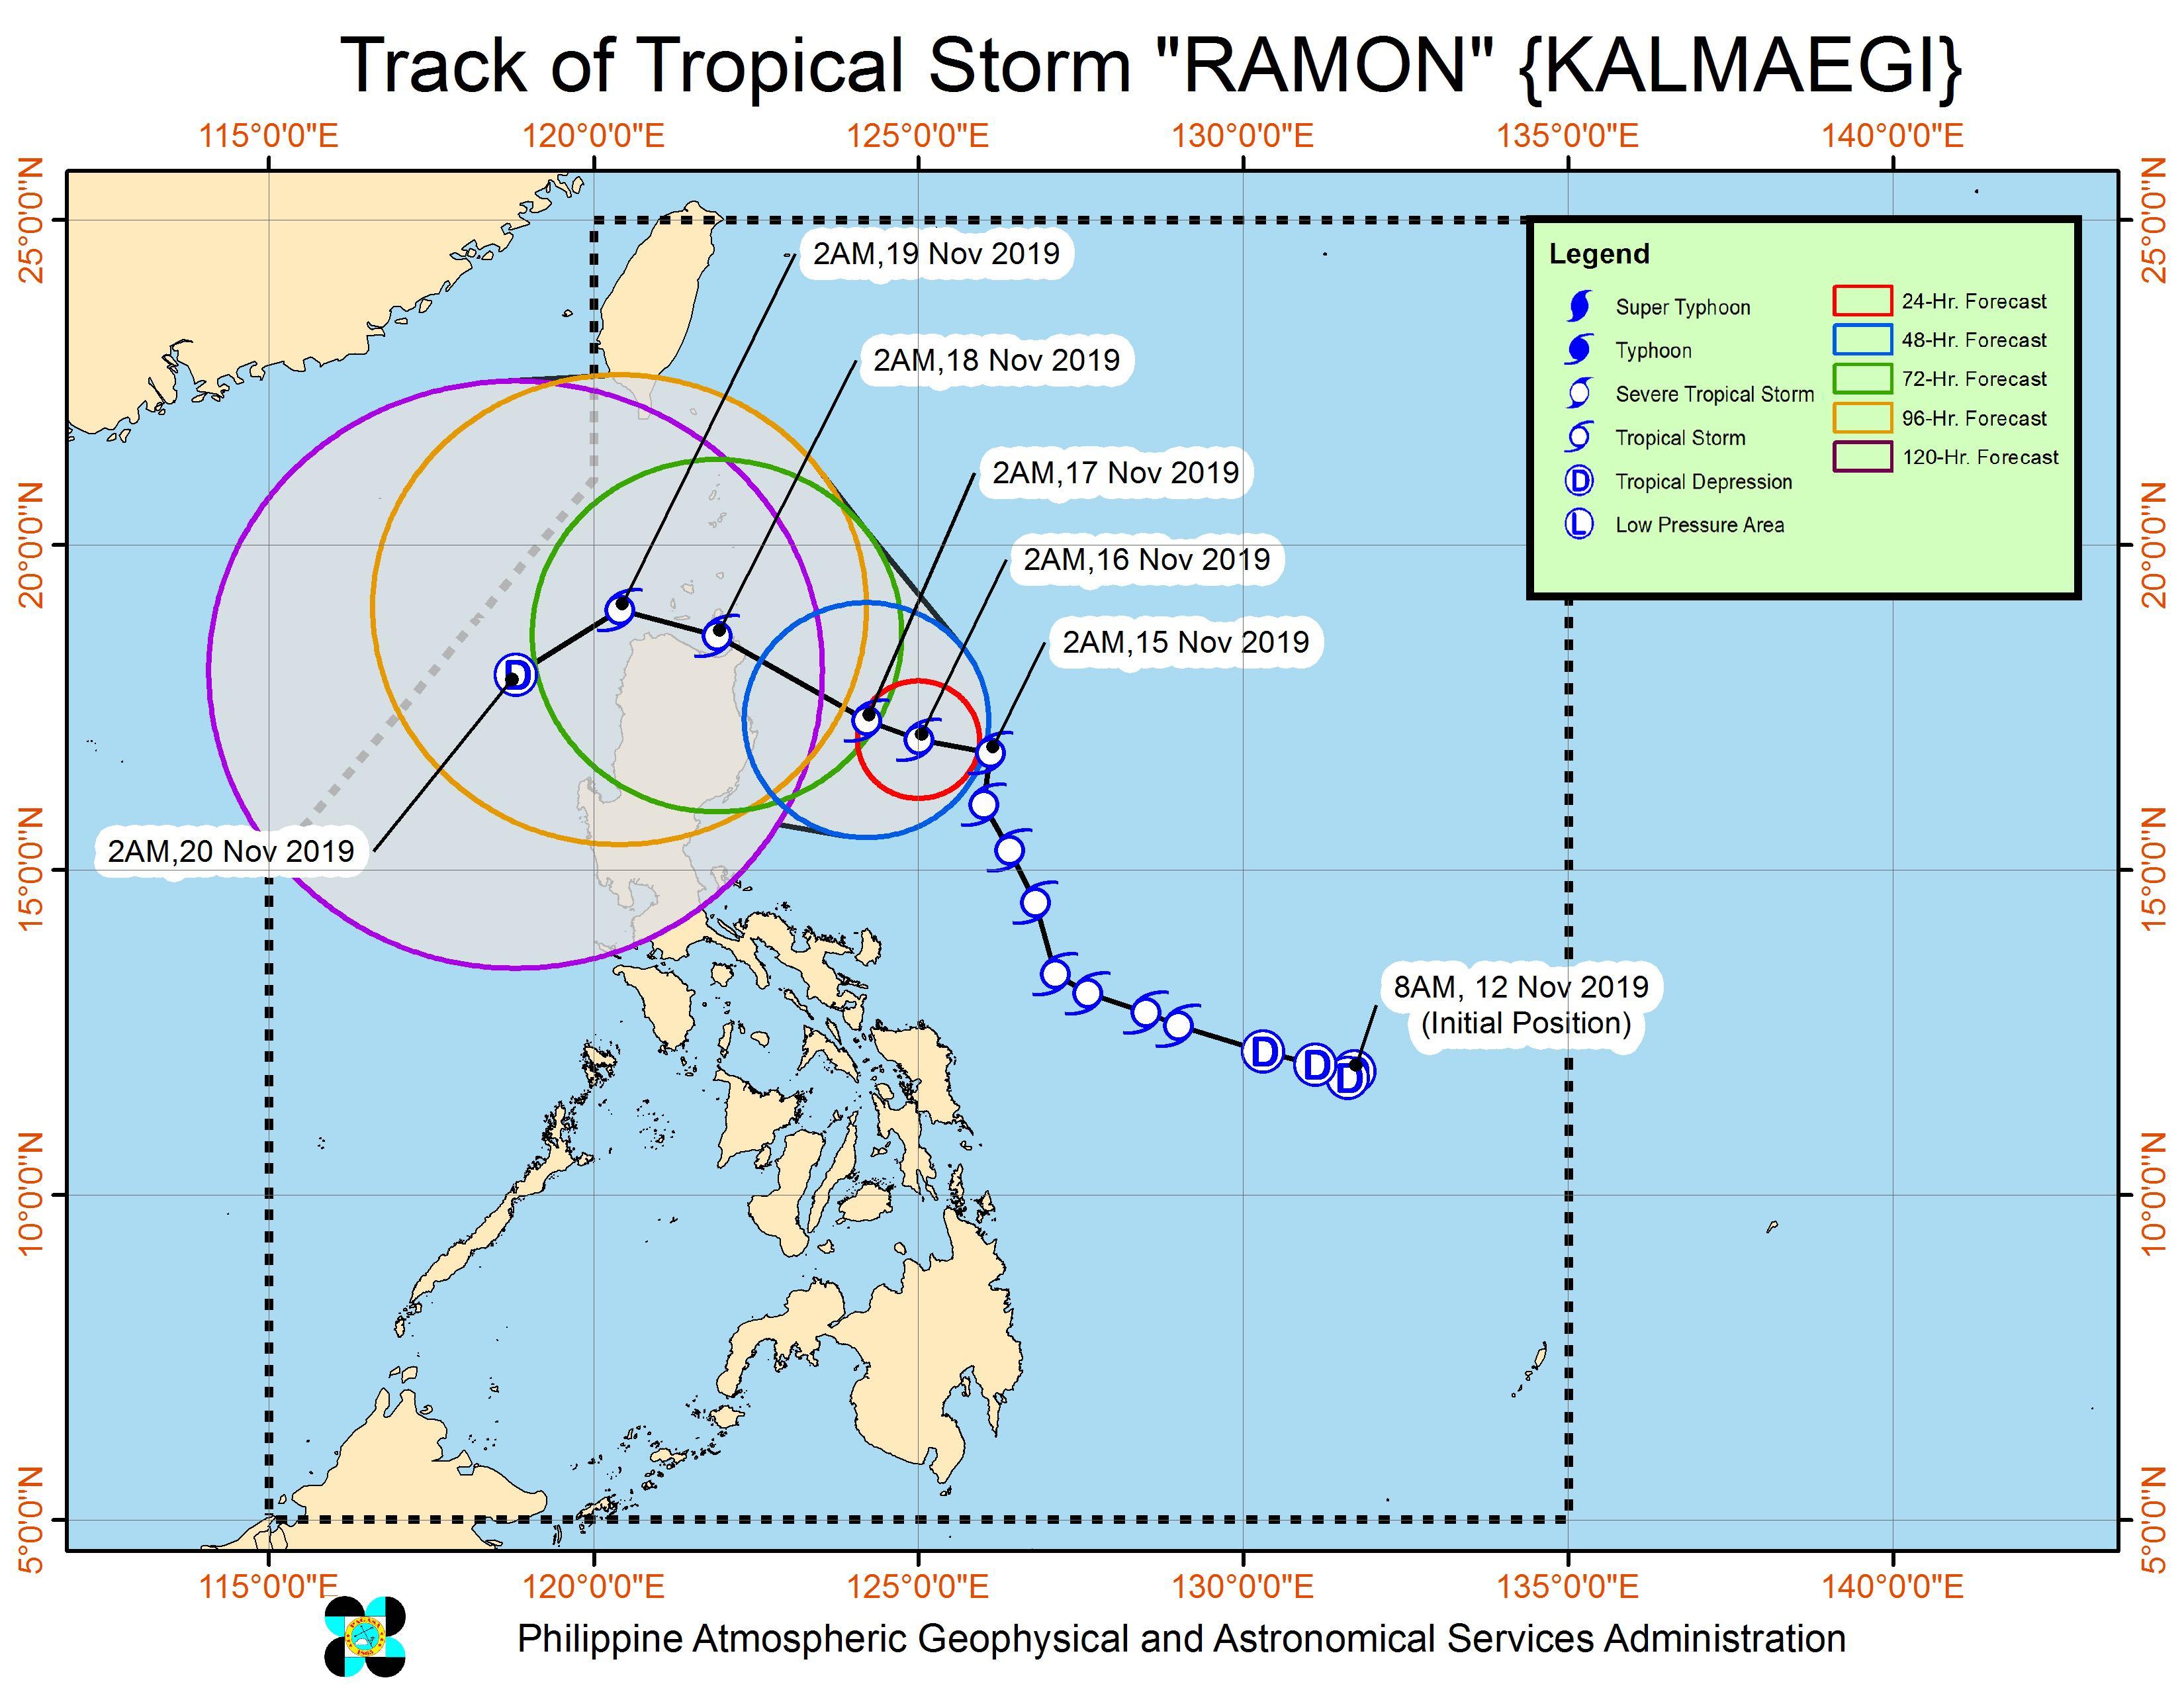 Forecast track of Tropical Storm Ramon (Kalmaegi) as of November 15, 2019, 5 am. Image from PAGASA